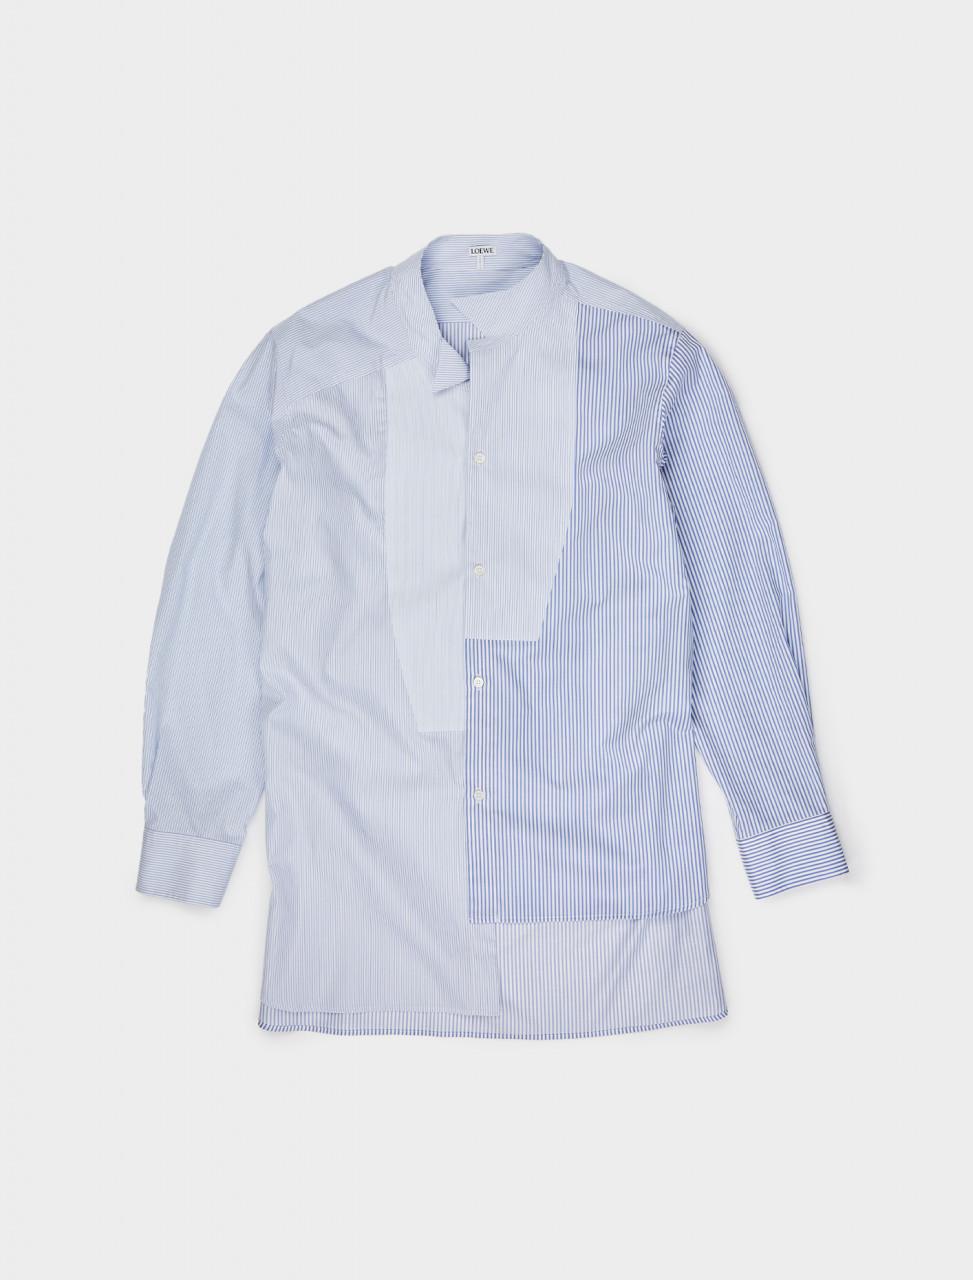 251-H526337W04 LOEWE SHIRT PATCHWORK ASYMMETRIC WHITE BLUE